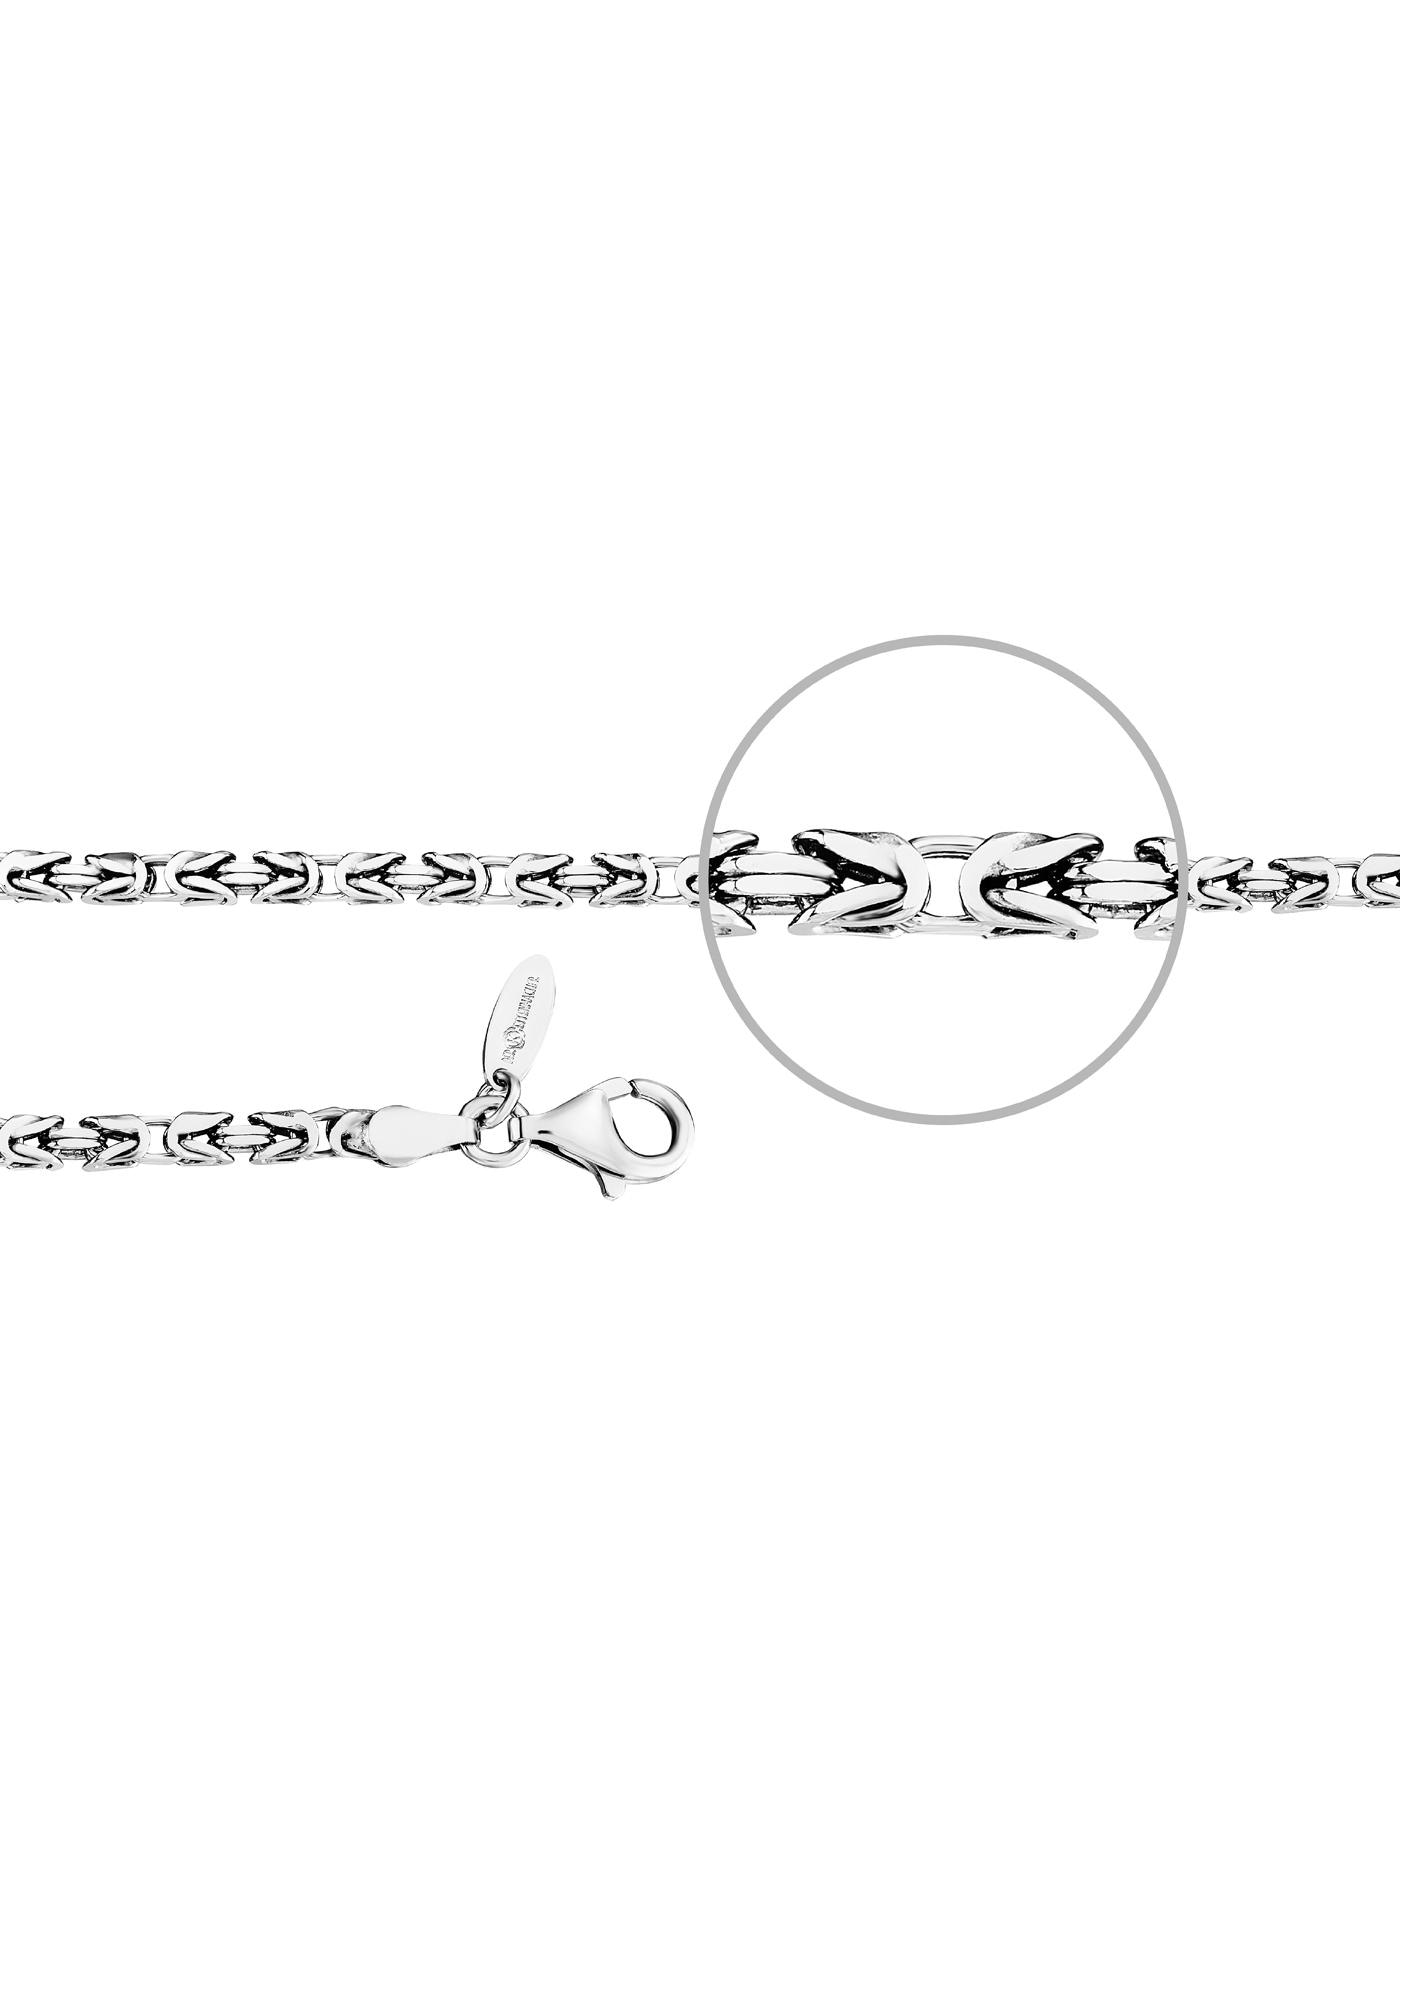 Der Kettenmacher Königsarmband »KÖ1-19S, KÖ1-21S« | Schmuck > Armbänder > Königsarmbänder | DER KETTENMACHER